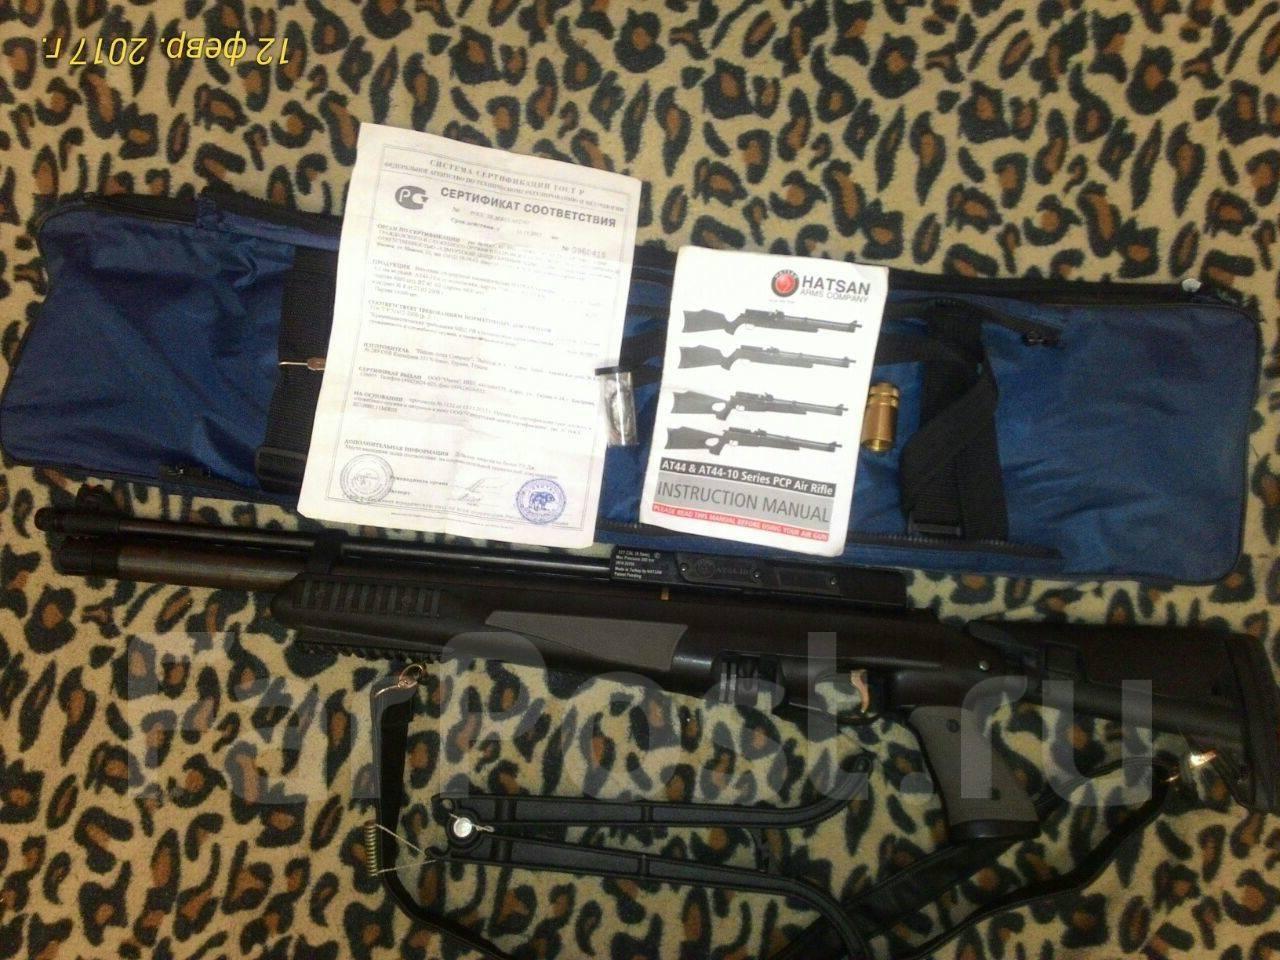 инструкция к винтовке хатсан pcp